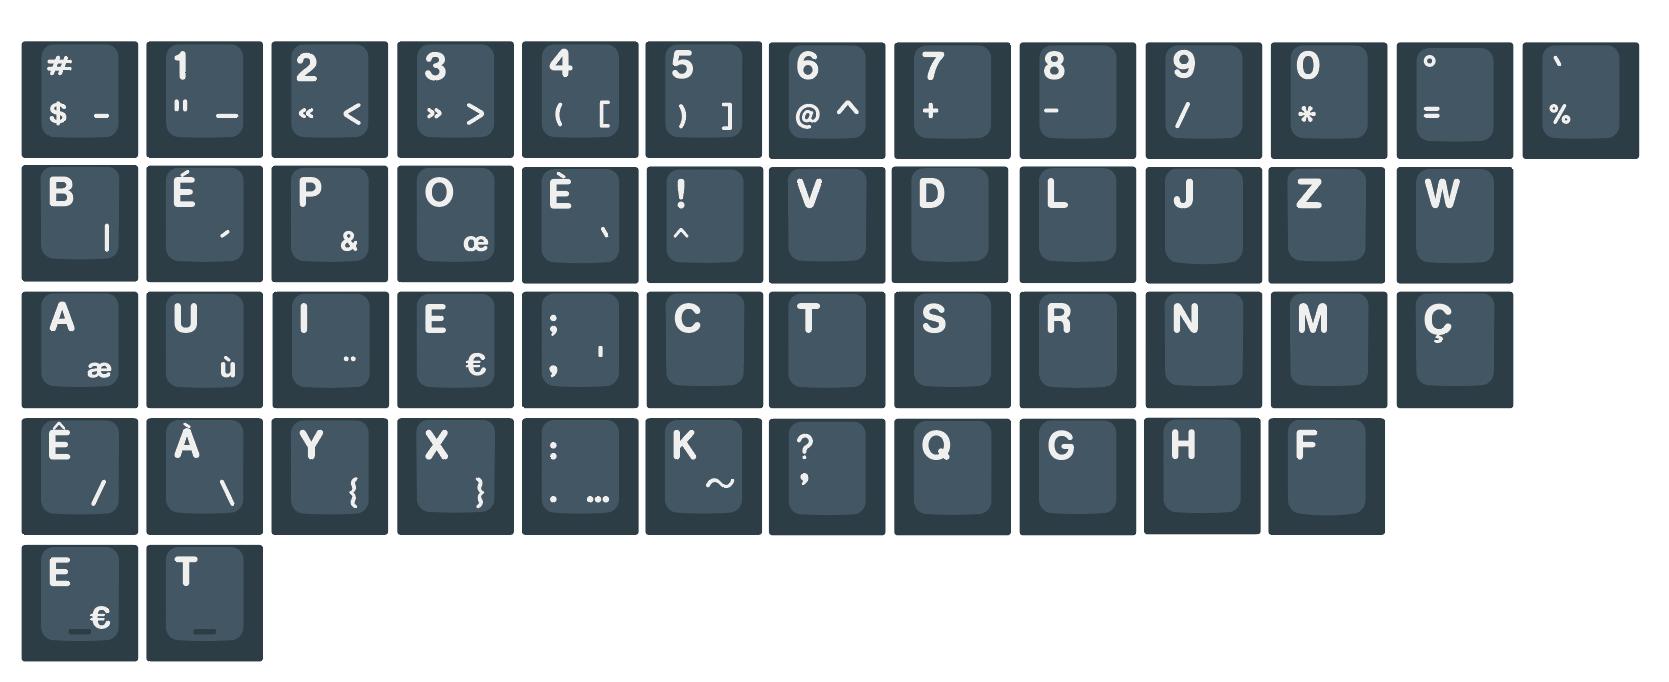 Zekth - Be The One keycaps set - bépo